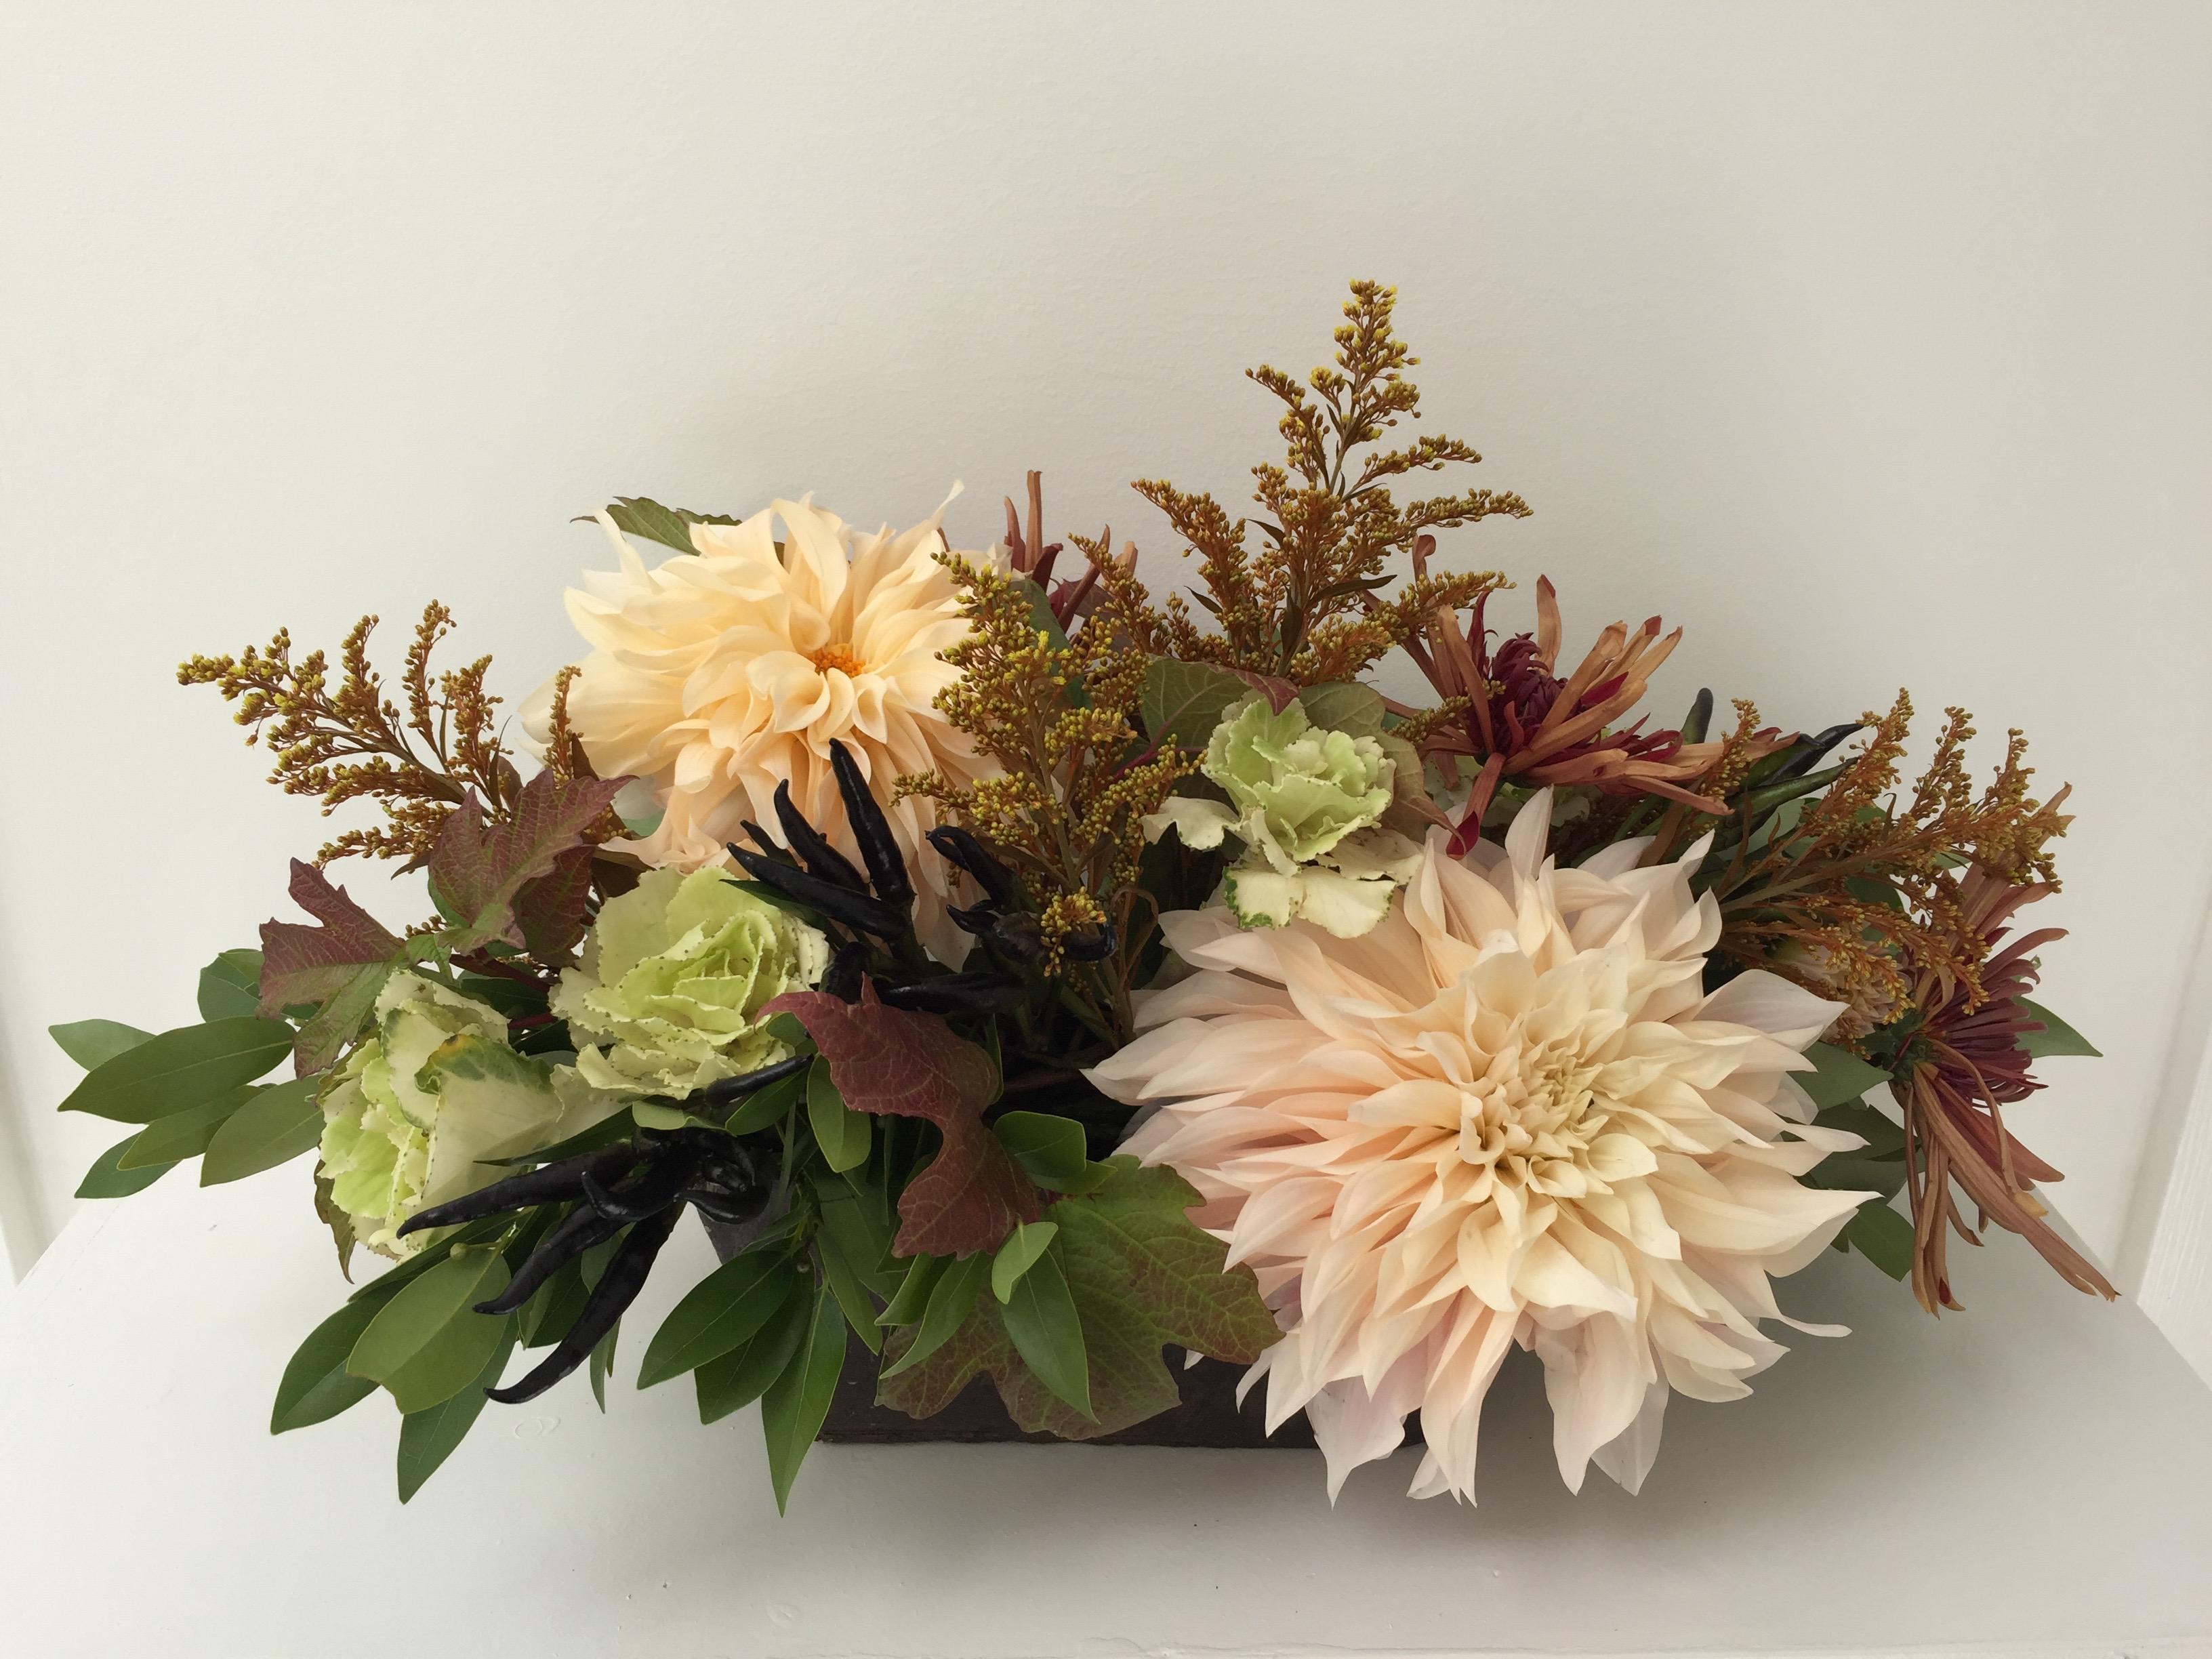 dahlias and edibles in arrangement